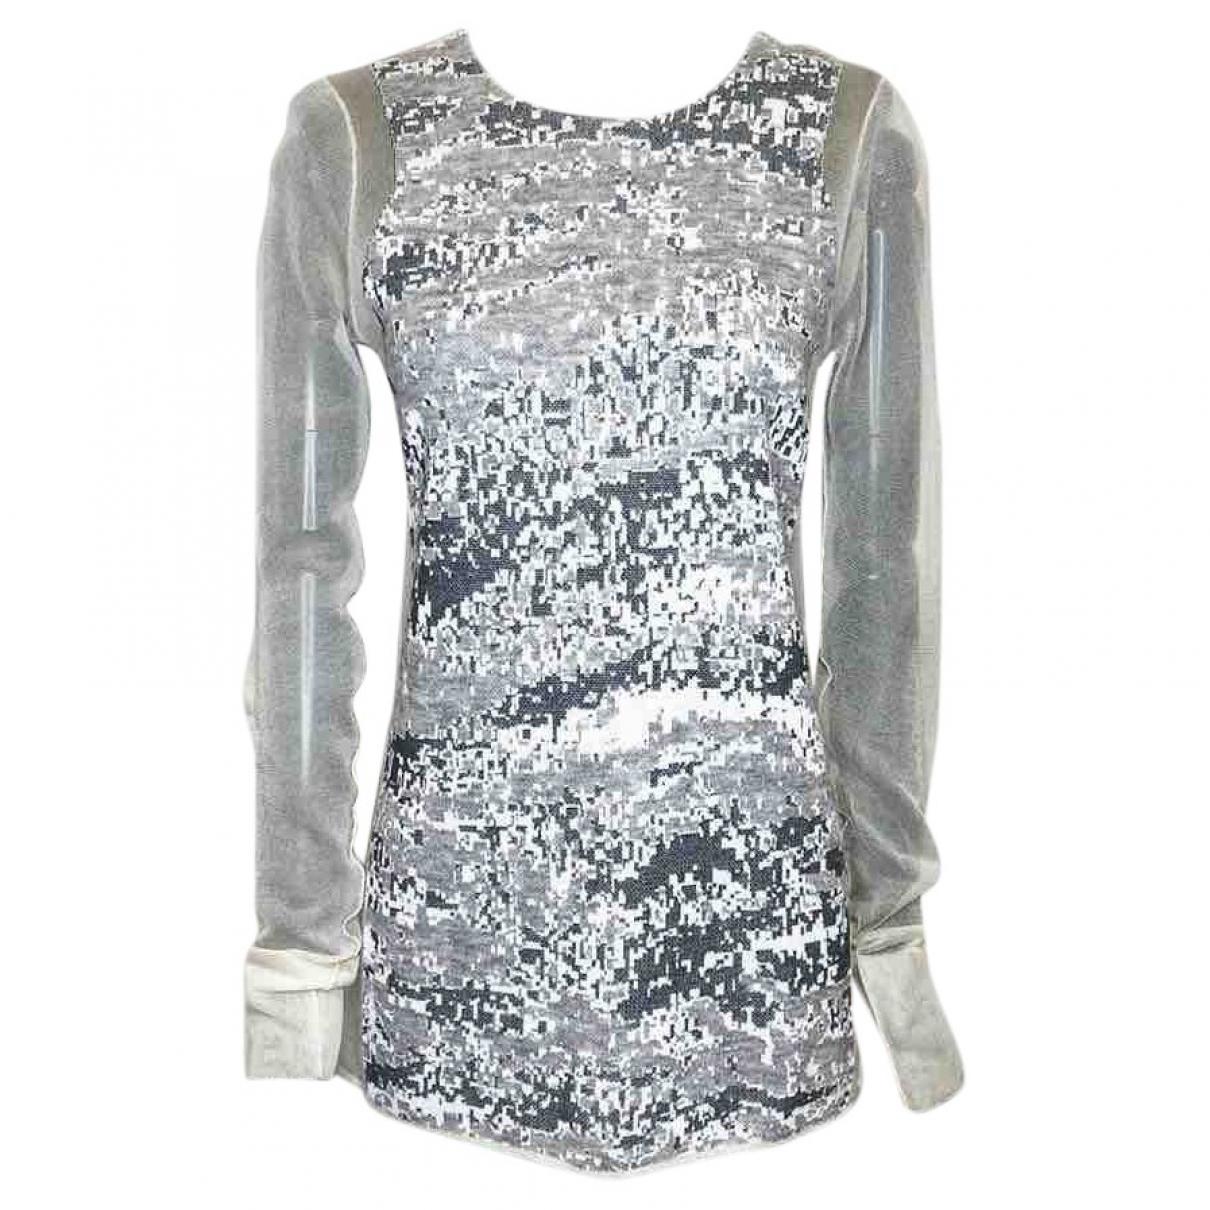 Alexander Wang \N White Knitwear for Women S International